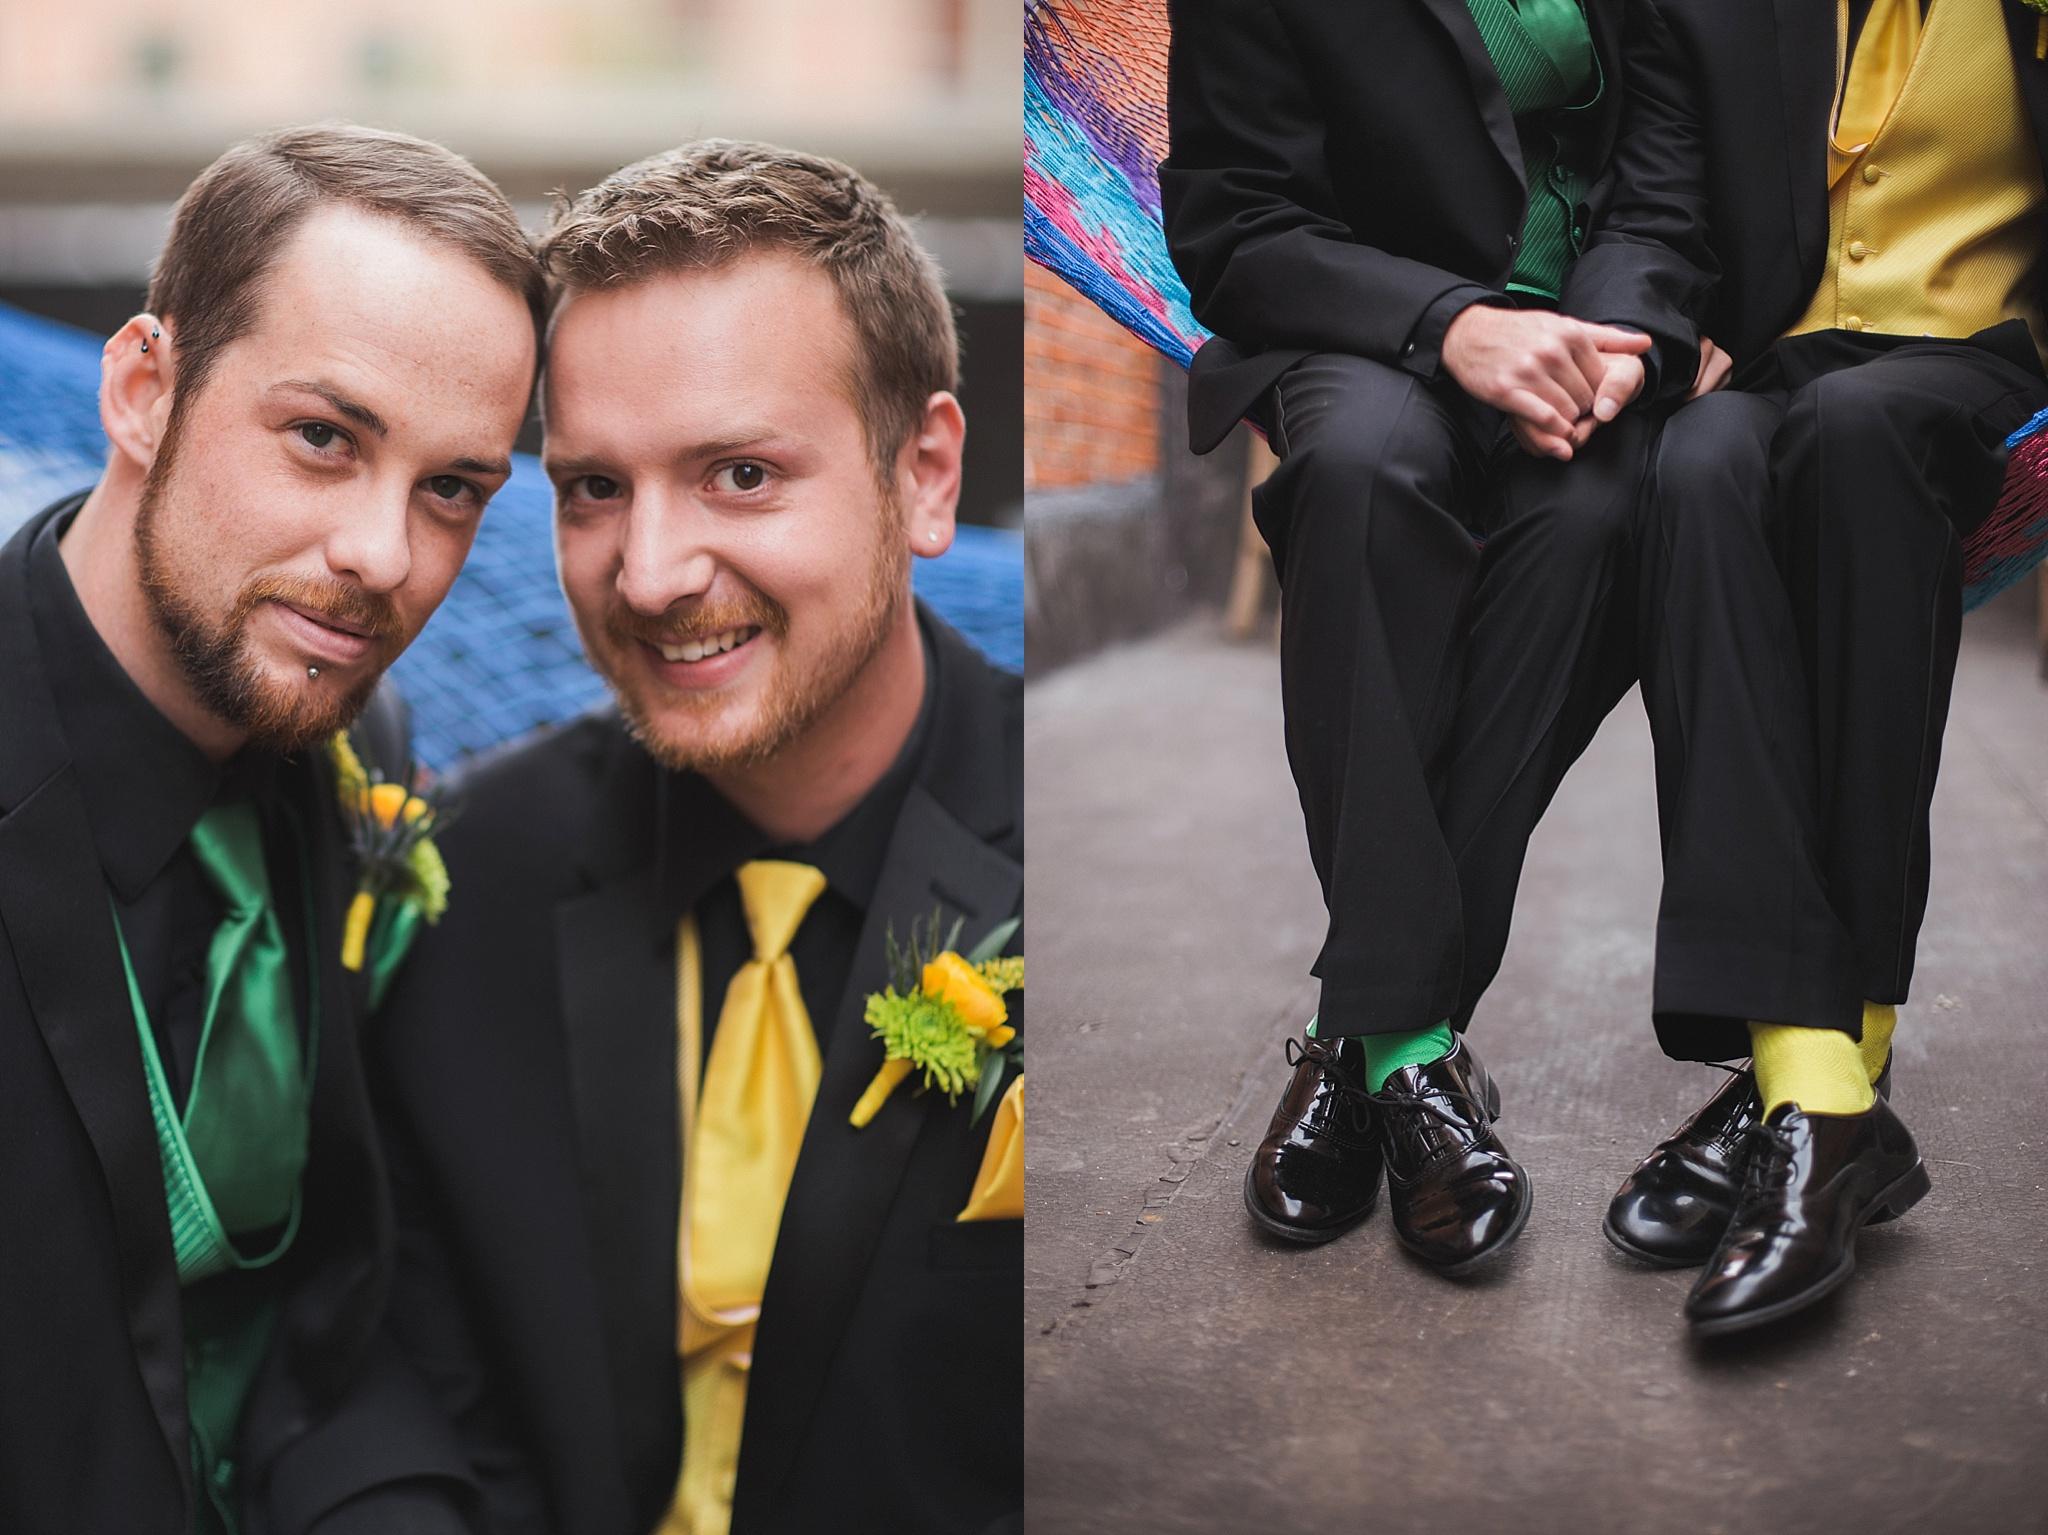 bozeman-montana-wedding-photographytana-wedding-photography